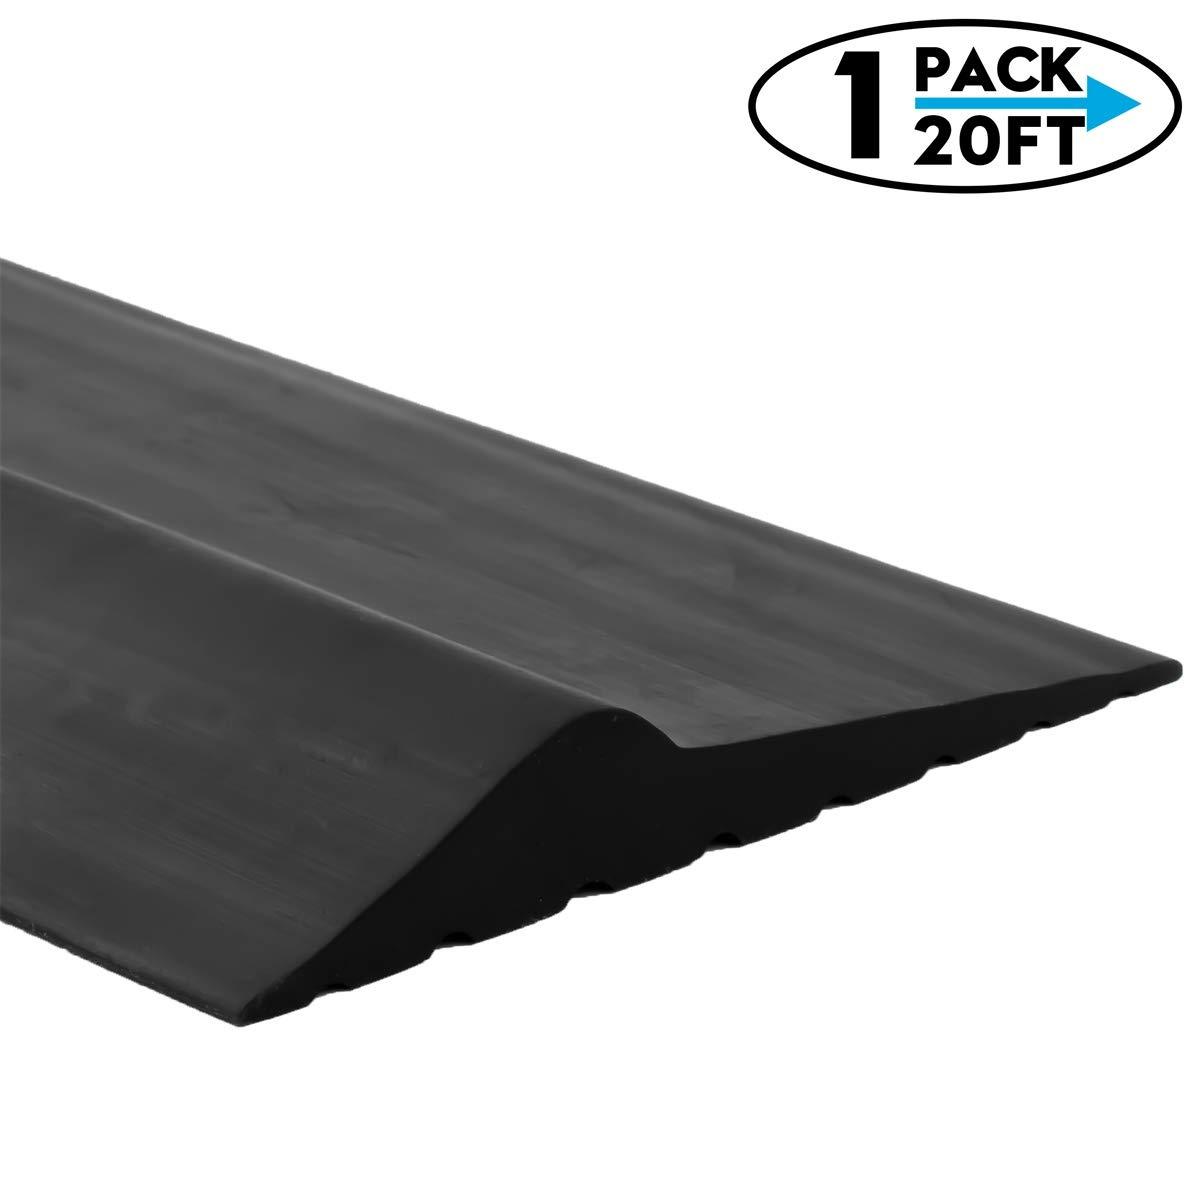 Weatherproof Universal Garage Door Bottom Threshold Seal Strip DIY Weather Stripping Replacement,Not Include Sealant/Adhesive (20Ft, Black) by CloudBuyer